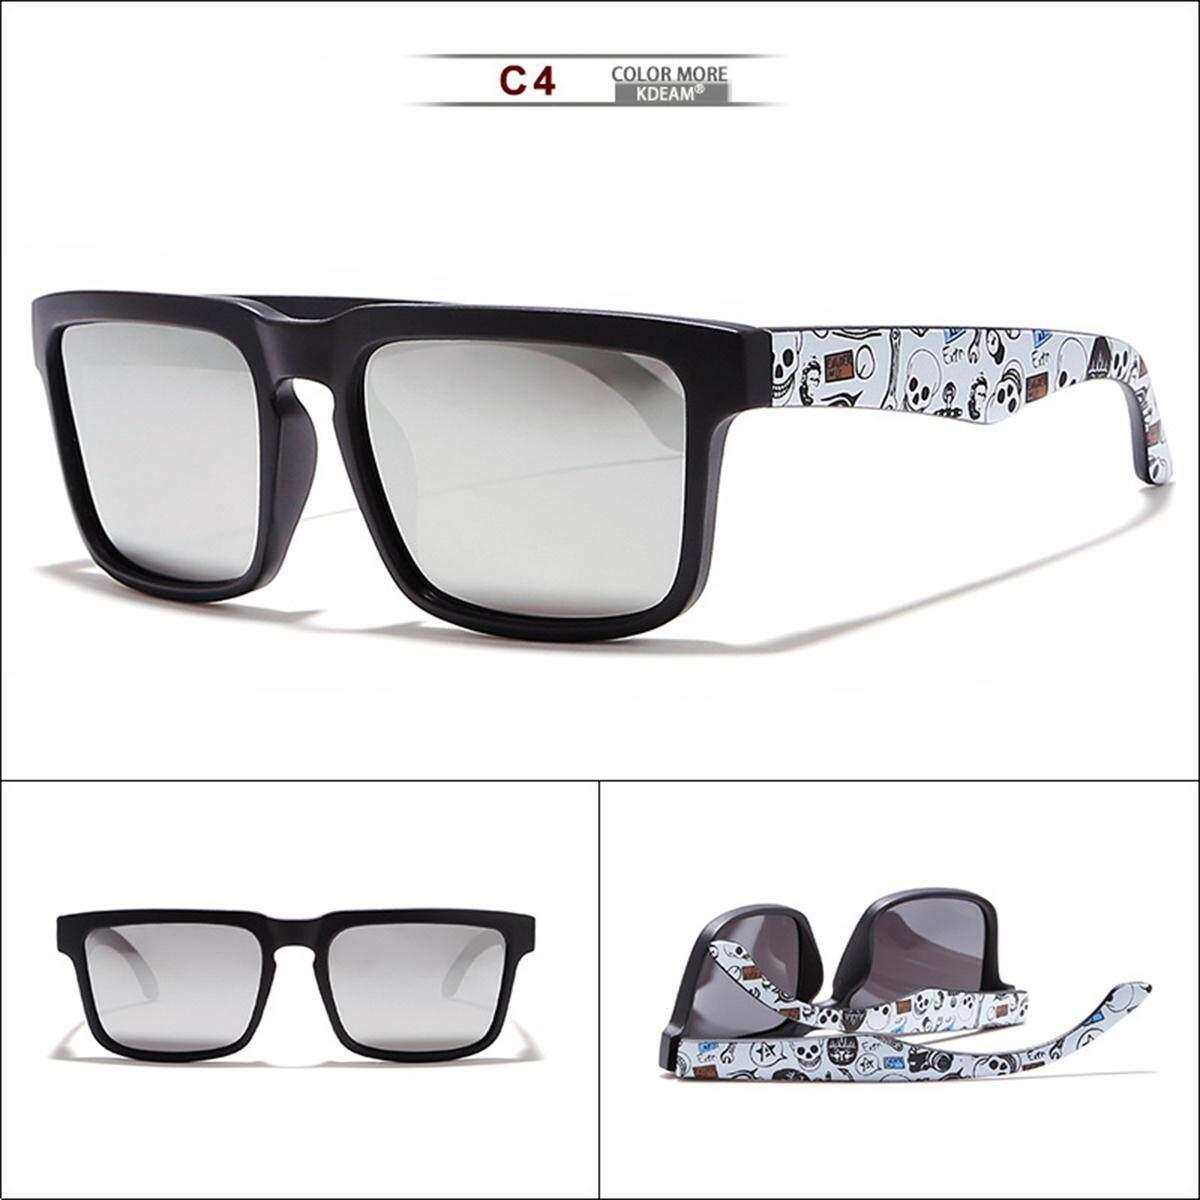 0ca0f39bbb4 KDEAM D2501 Polarized Sunglasses Square Sport Eyewear UV400 Driving Cycling  - intl